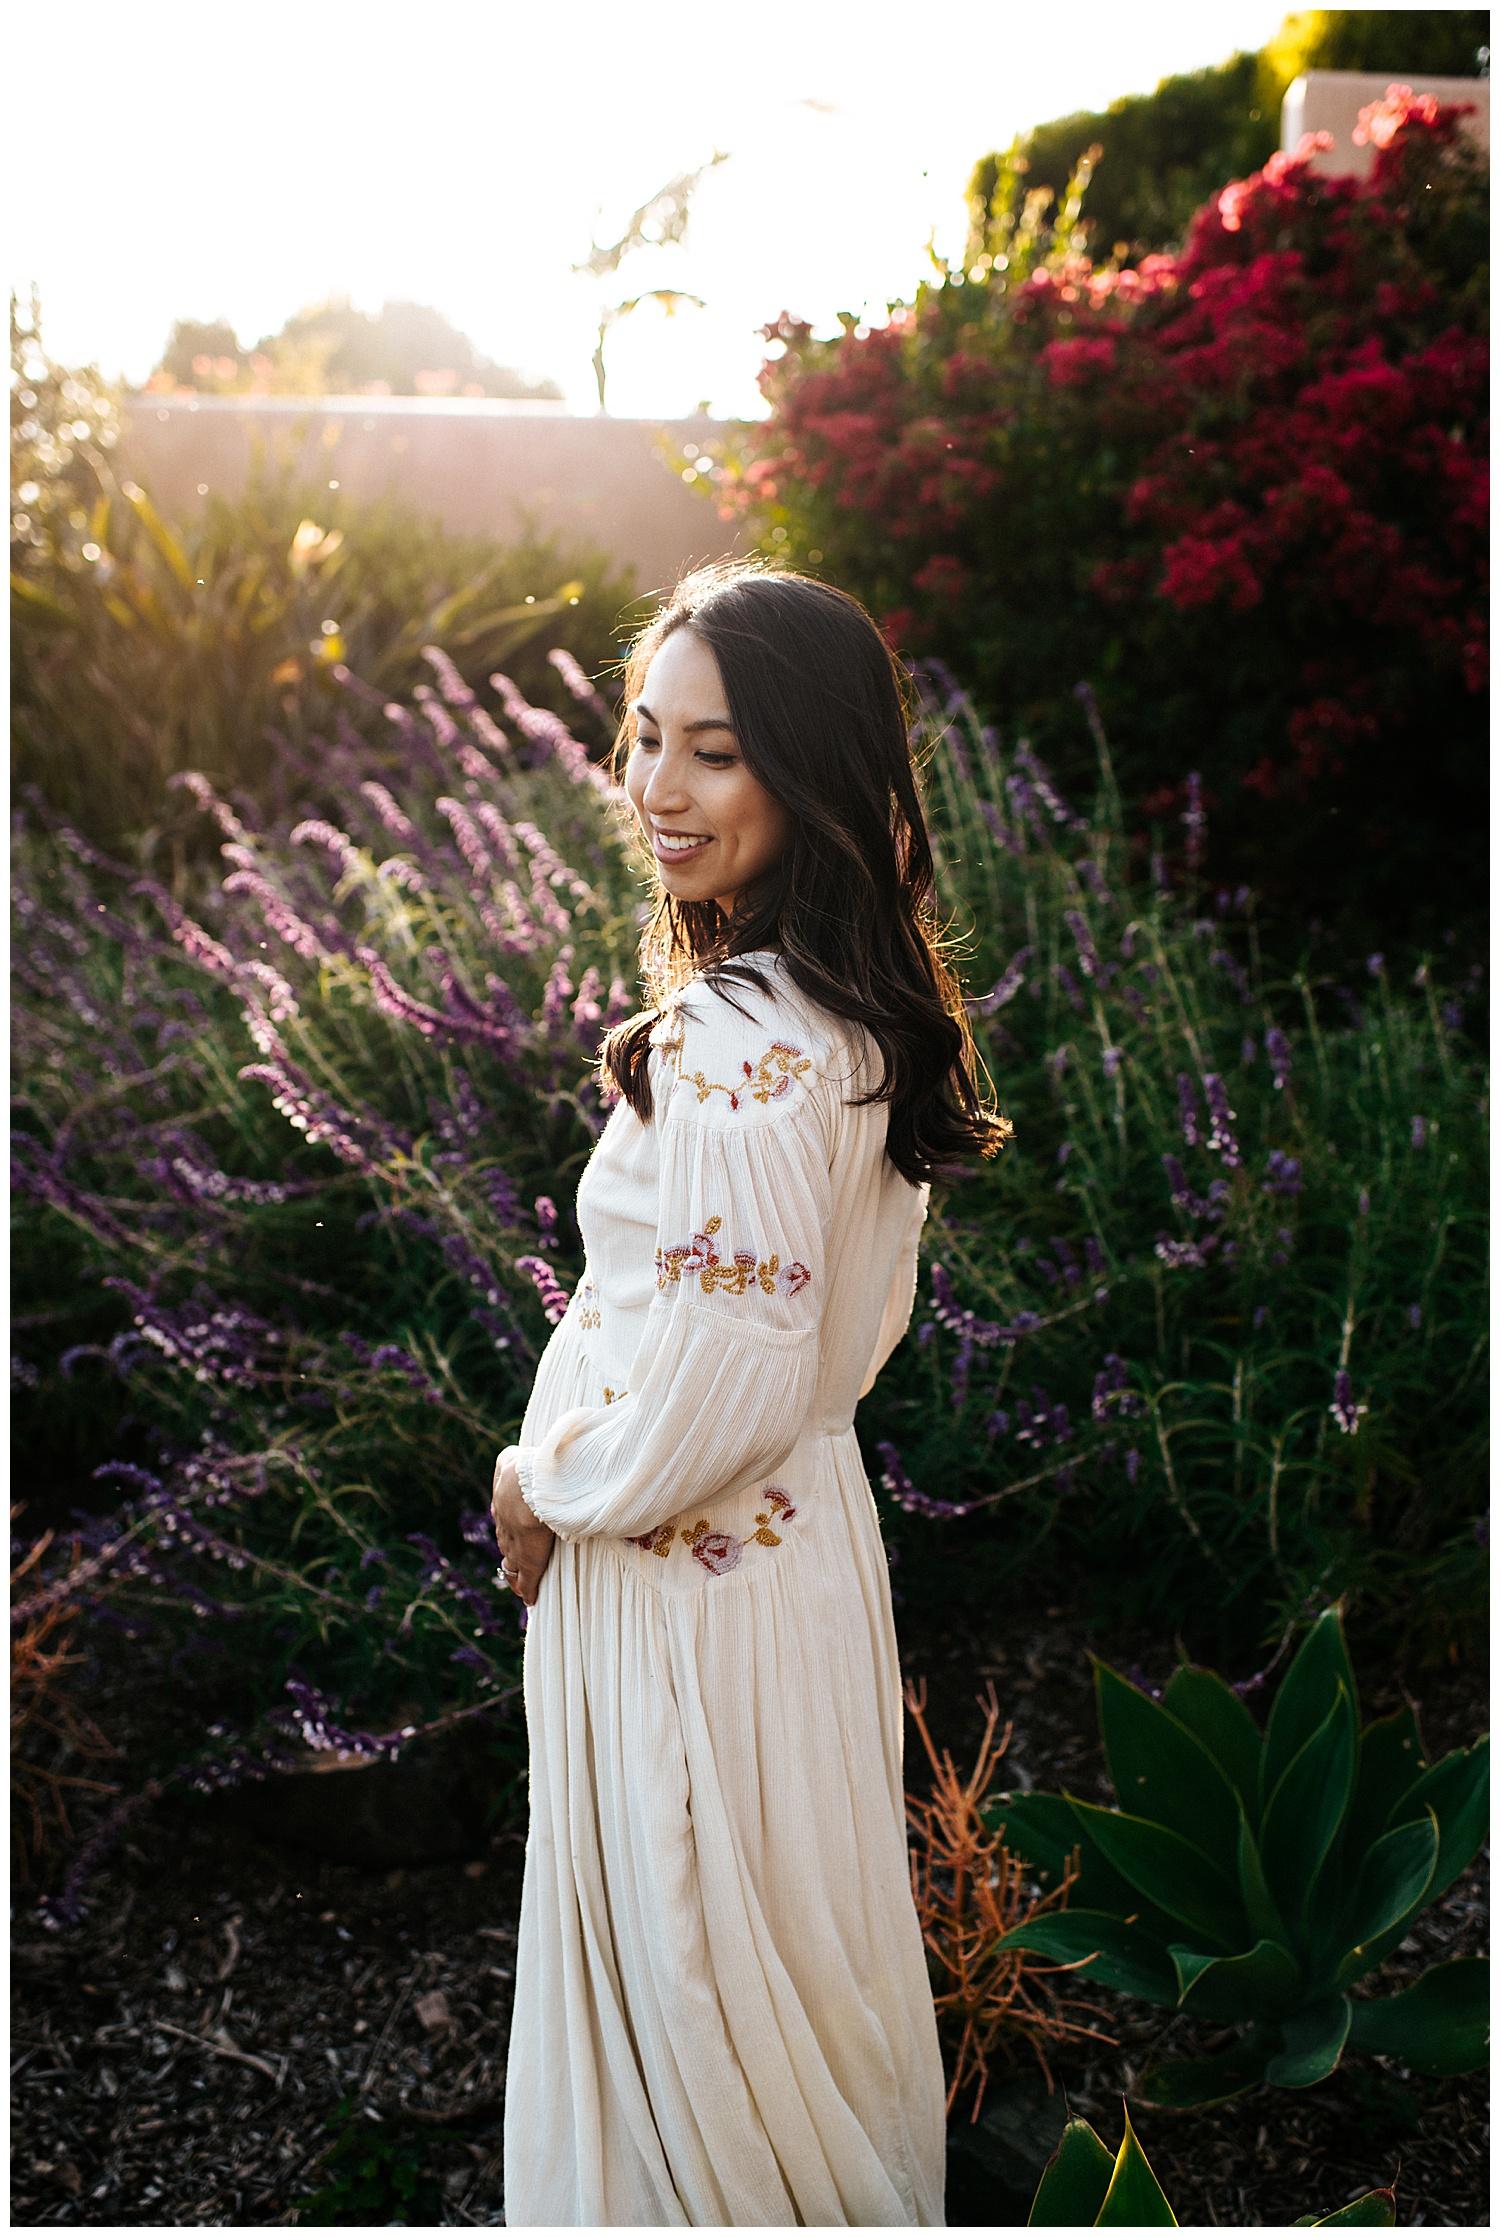 SamErica Studios - San Diego Maternity Photographer - Modern Palm Tree Desert Oasis Maternity Session - San Diego Babymoon at the Villas at Rancho Valencia_0029.jpg